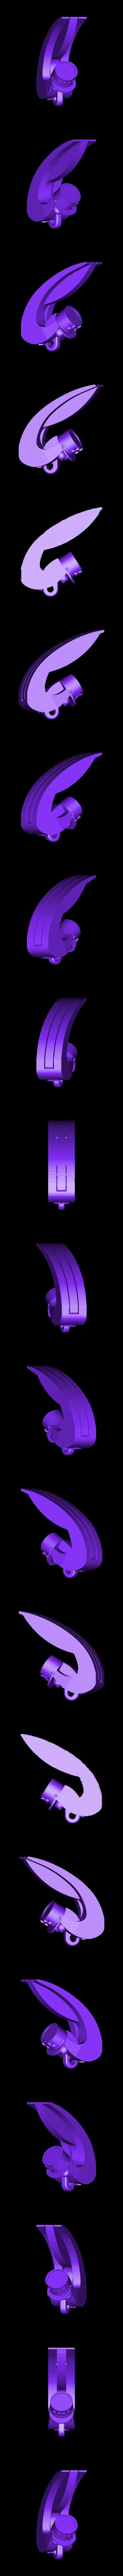 STRATI DE GAULLE.stl Download free STL file STRATI • 3D printer template, DJER